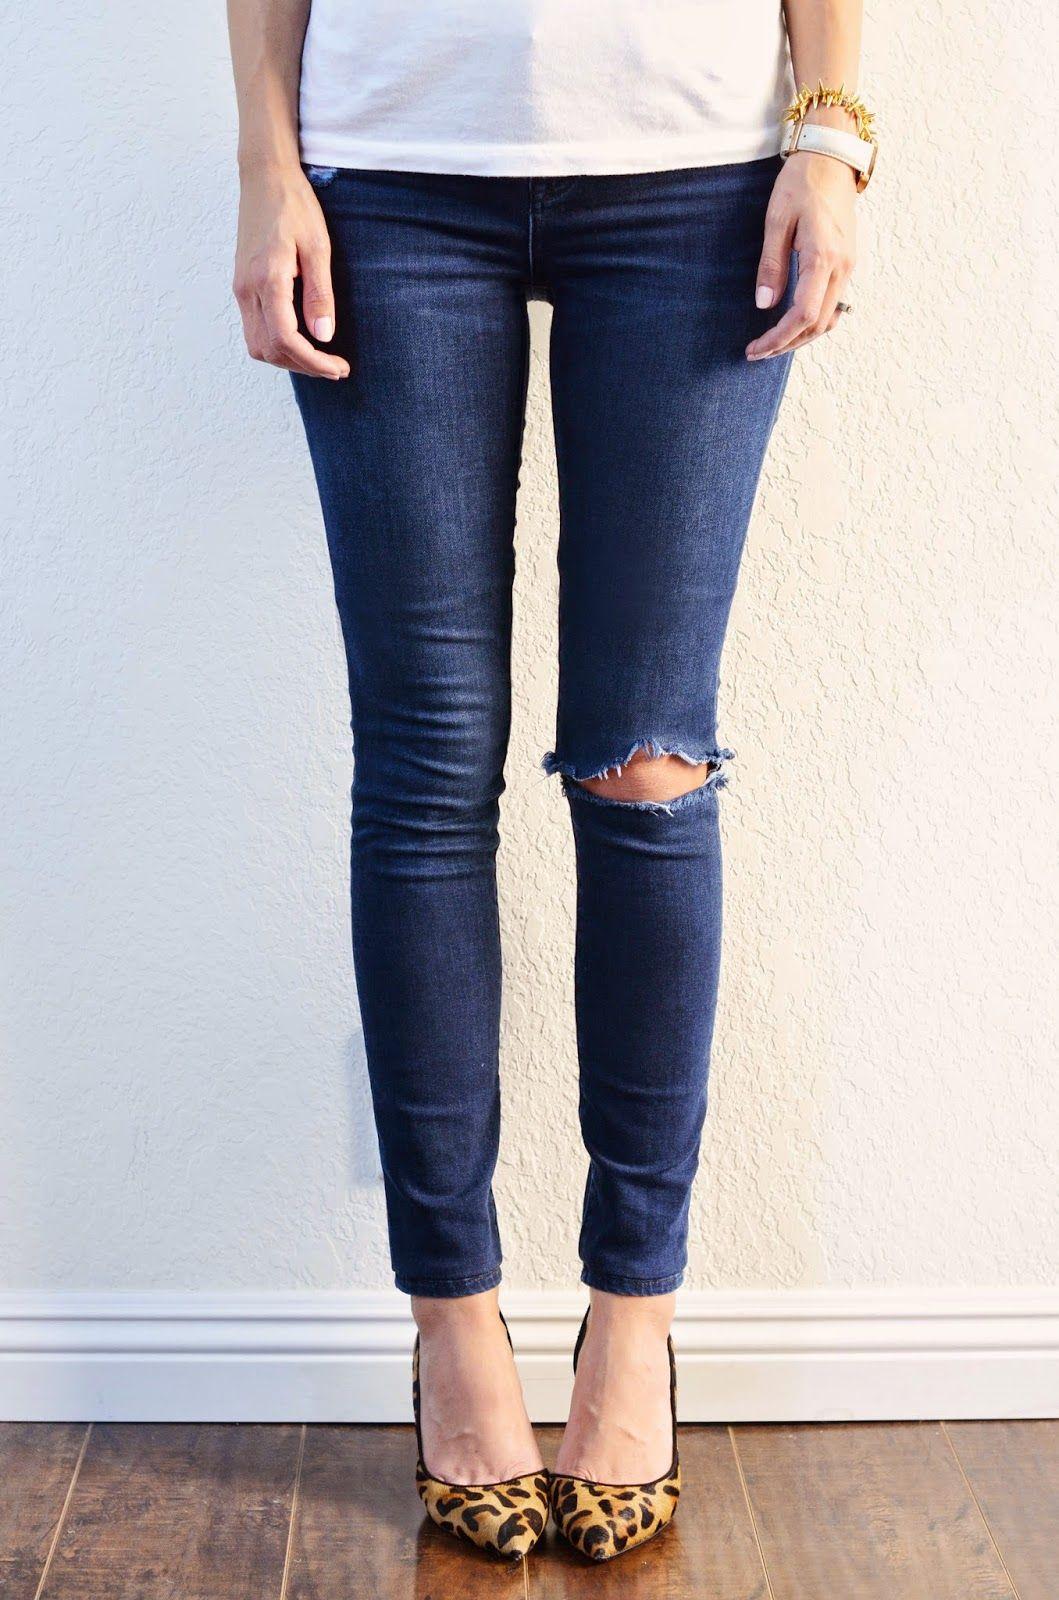 DIY: hemming jeans + keeping the original hem